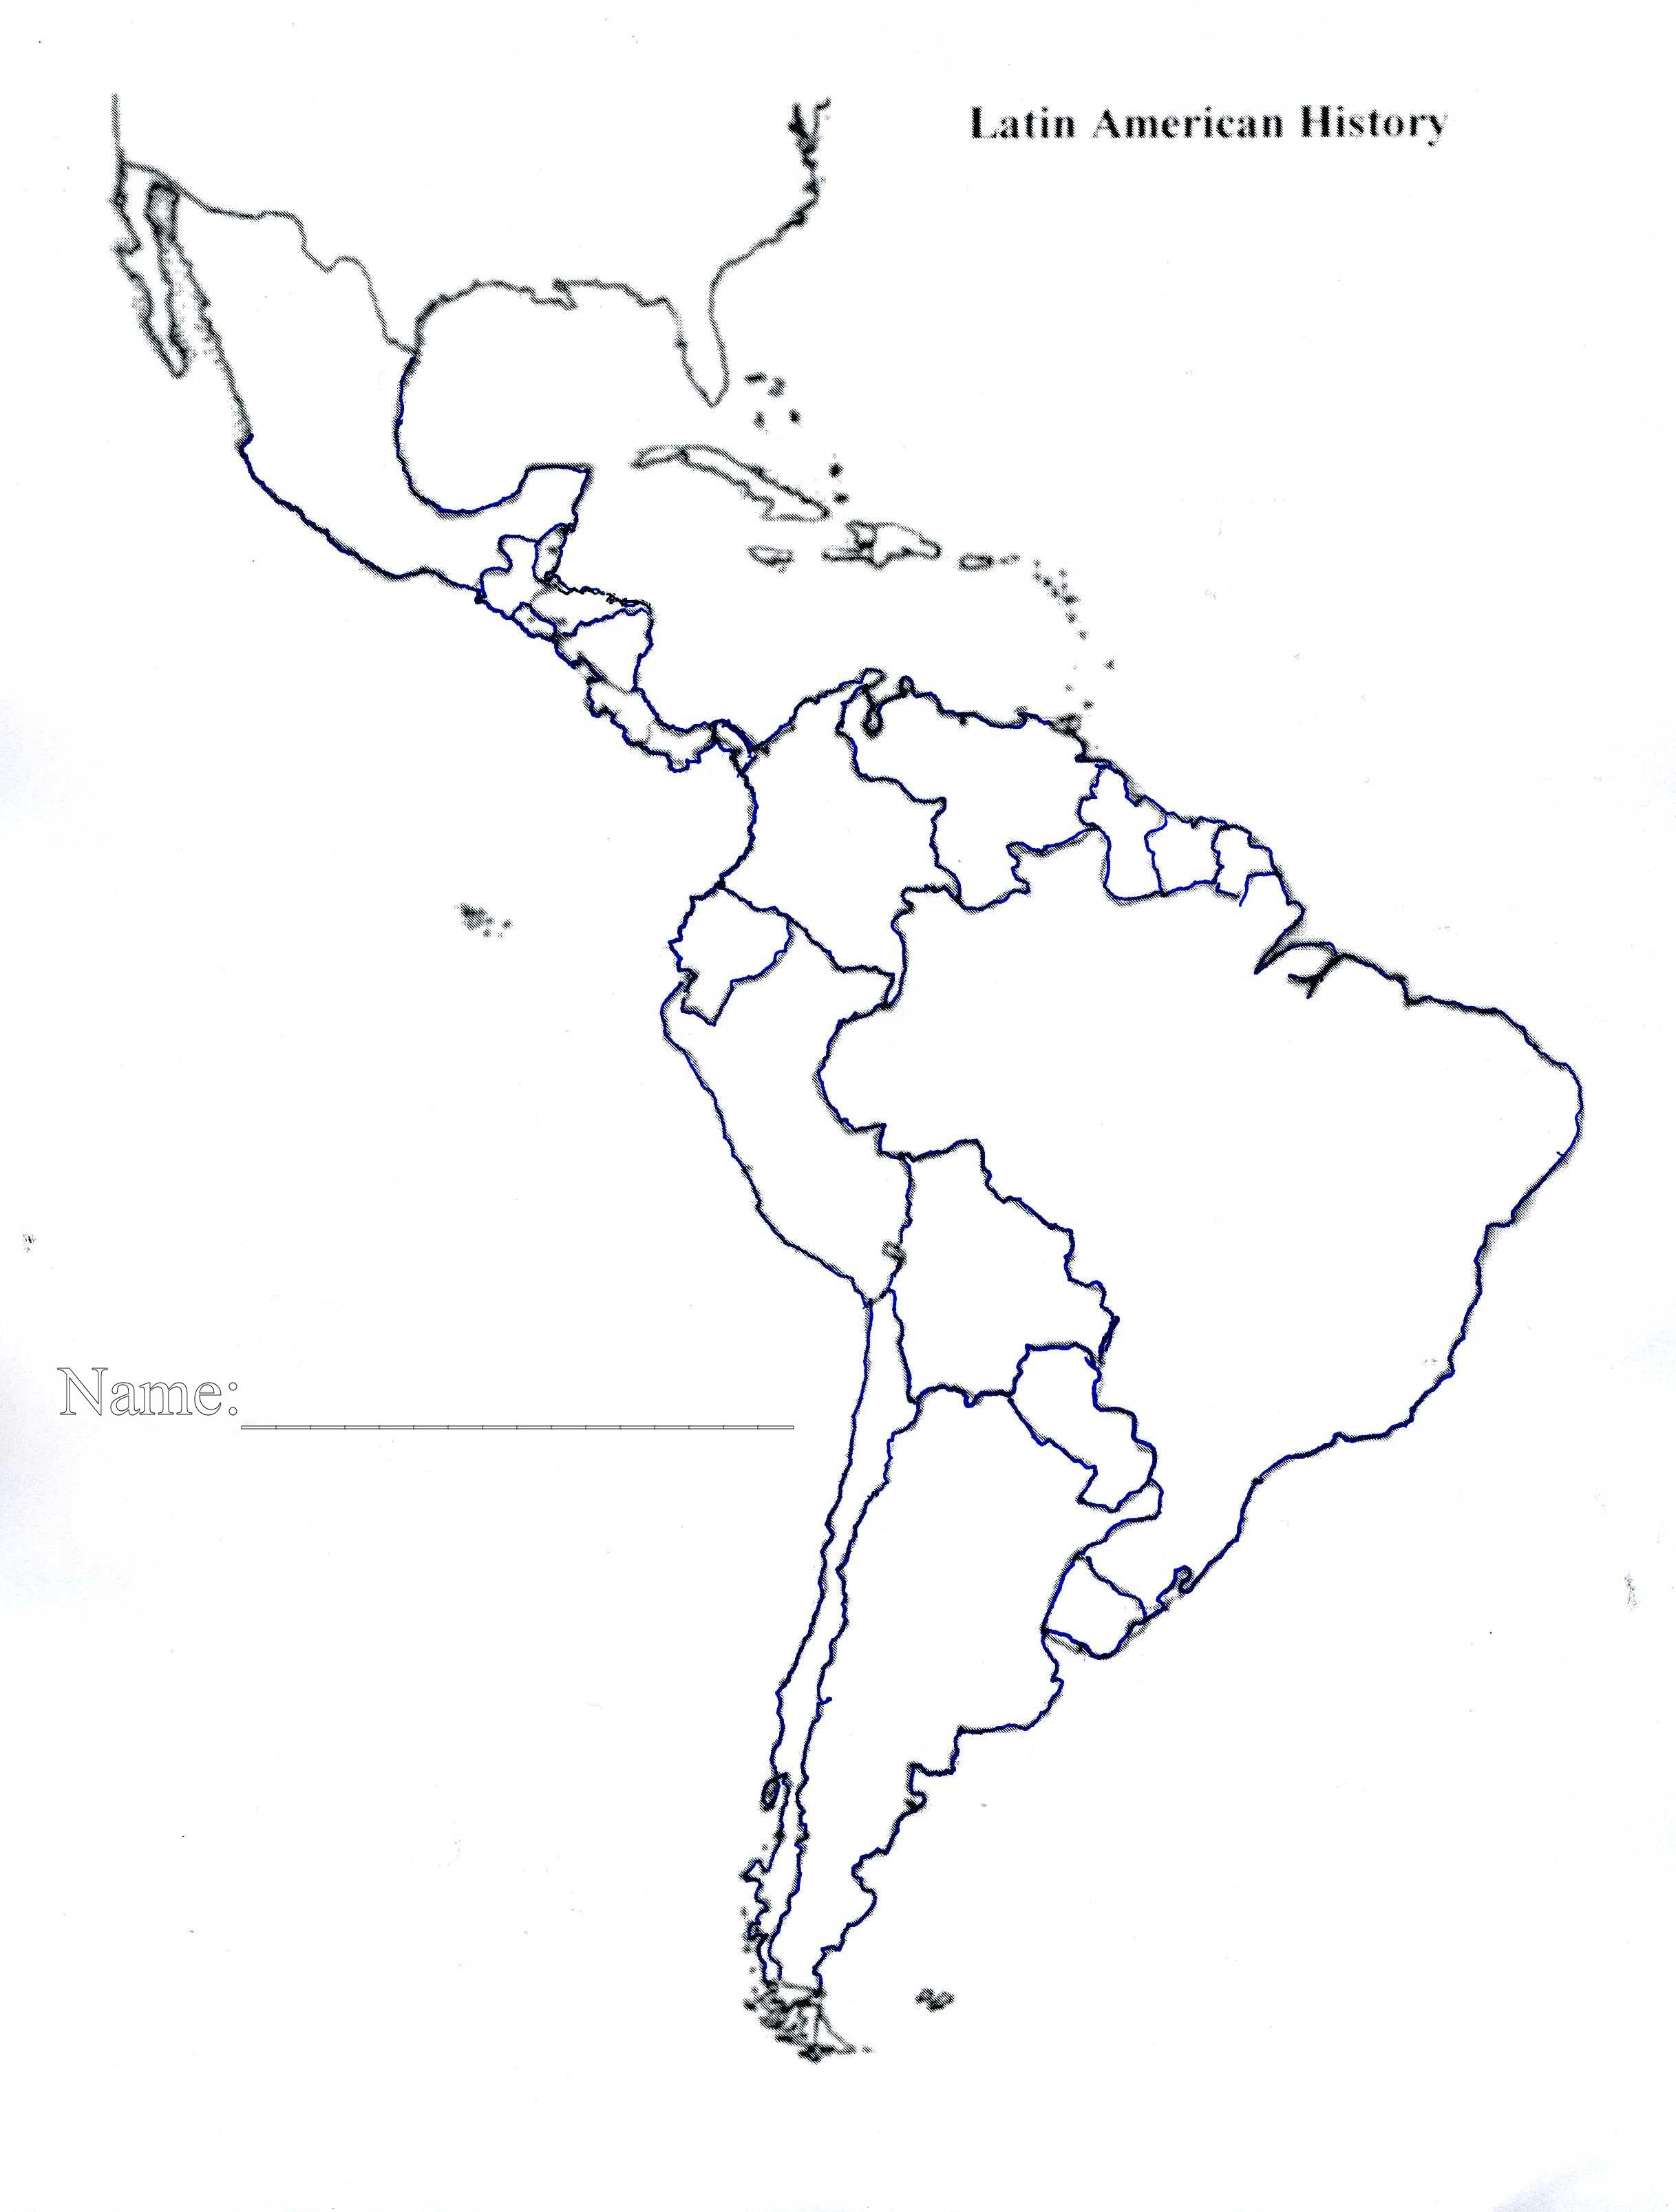 Map South America Blank Printable | Globalsupportinitiative - Blank Map Of Latin America Printable